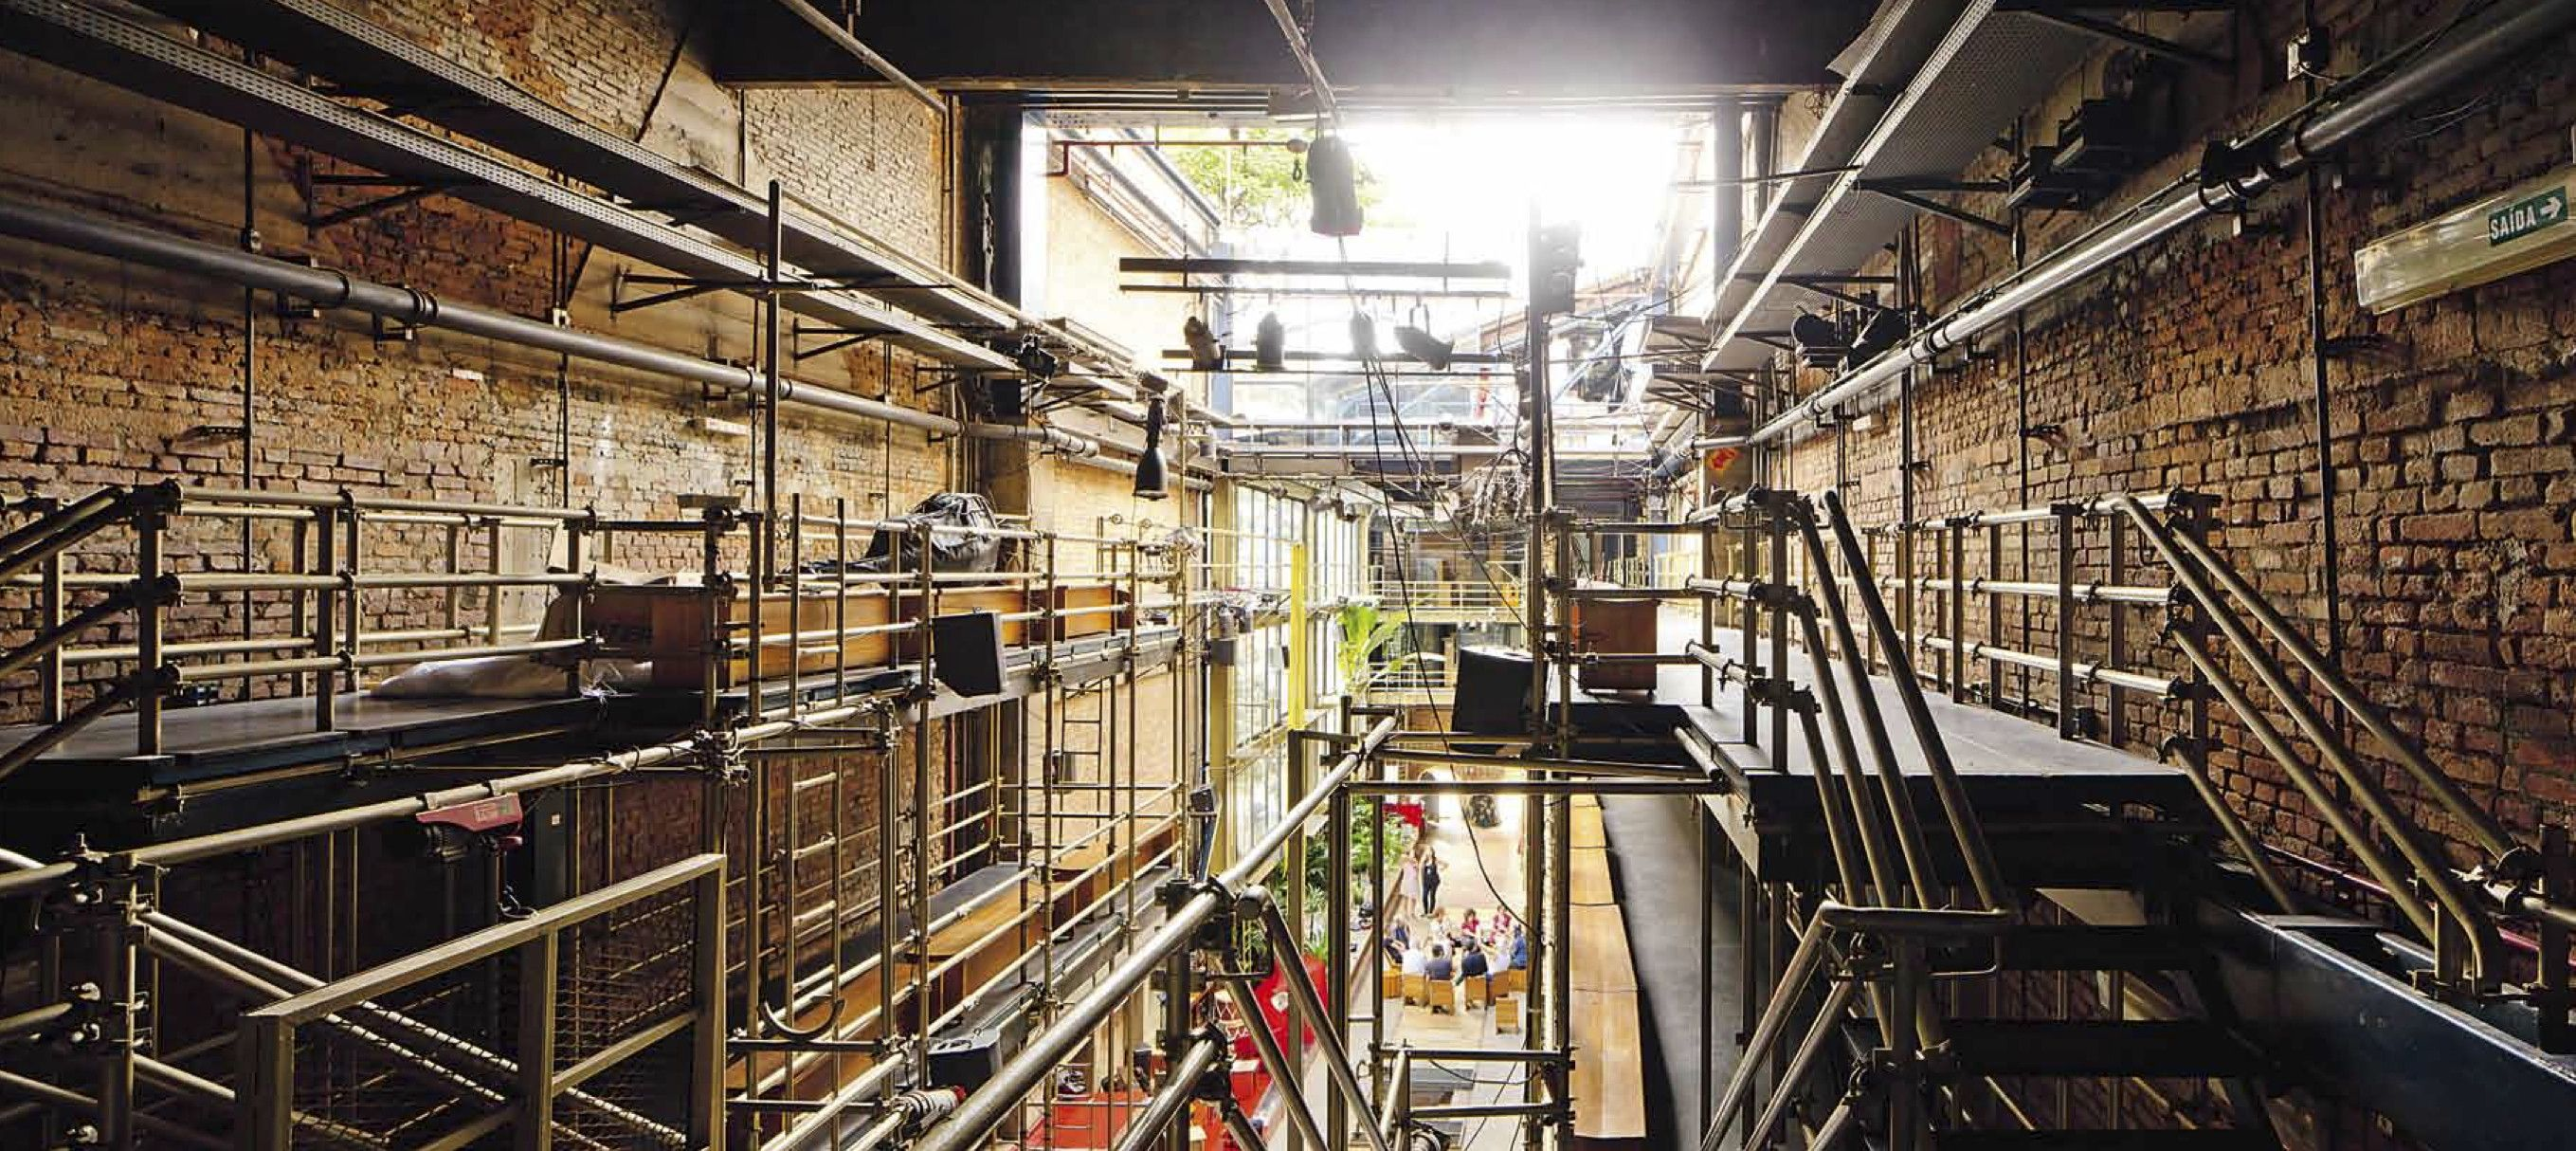 Afbeeldingsresultaat Voor Teatro Oficina Sao Paulo Theatre Architecture Renovation Architecture Contemporary Architecture Design